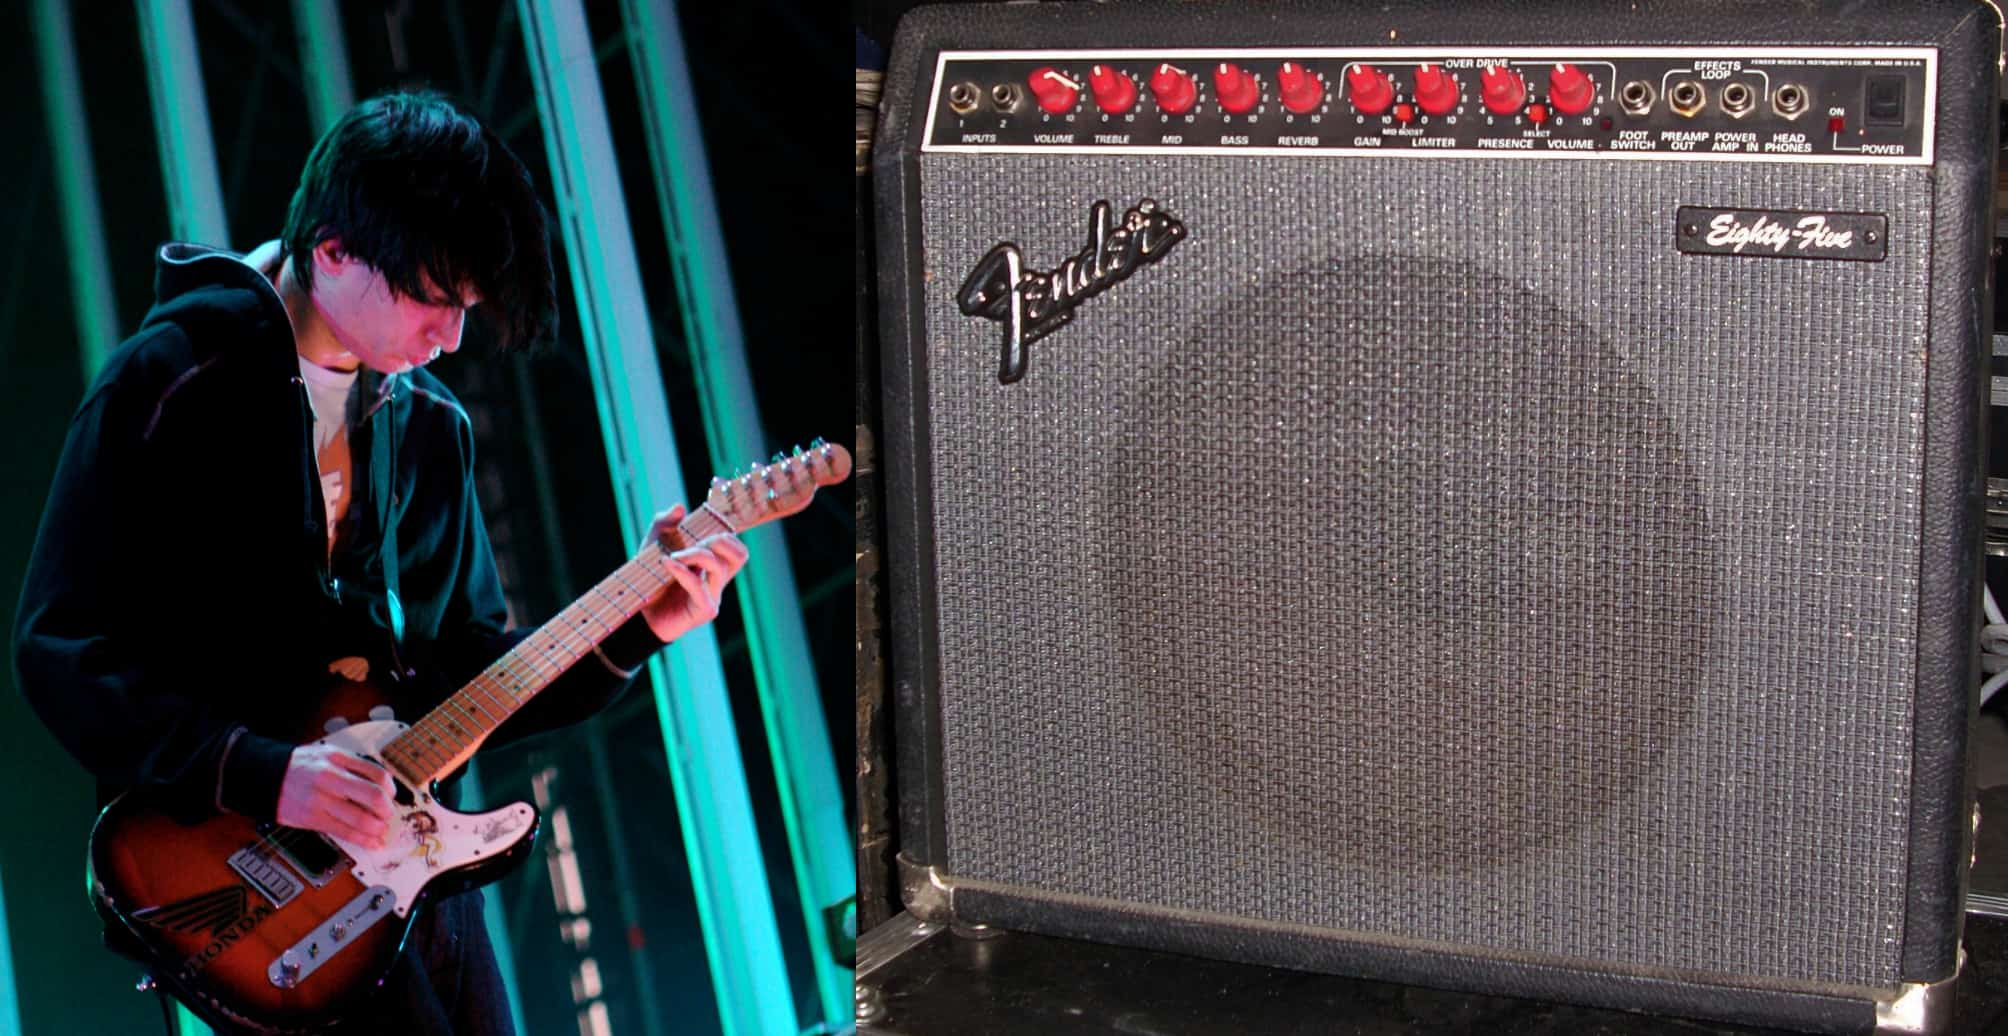 Jonny Greenwood playing a Fender Eighty-Five